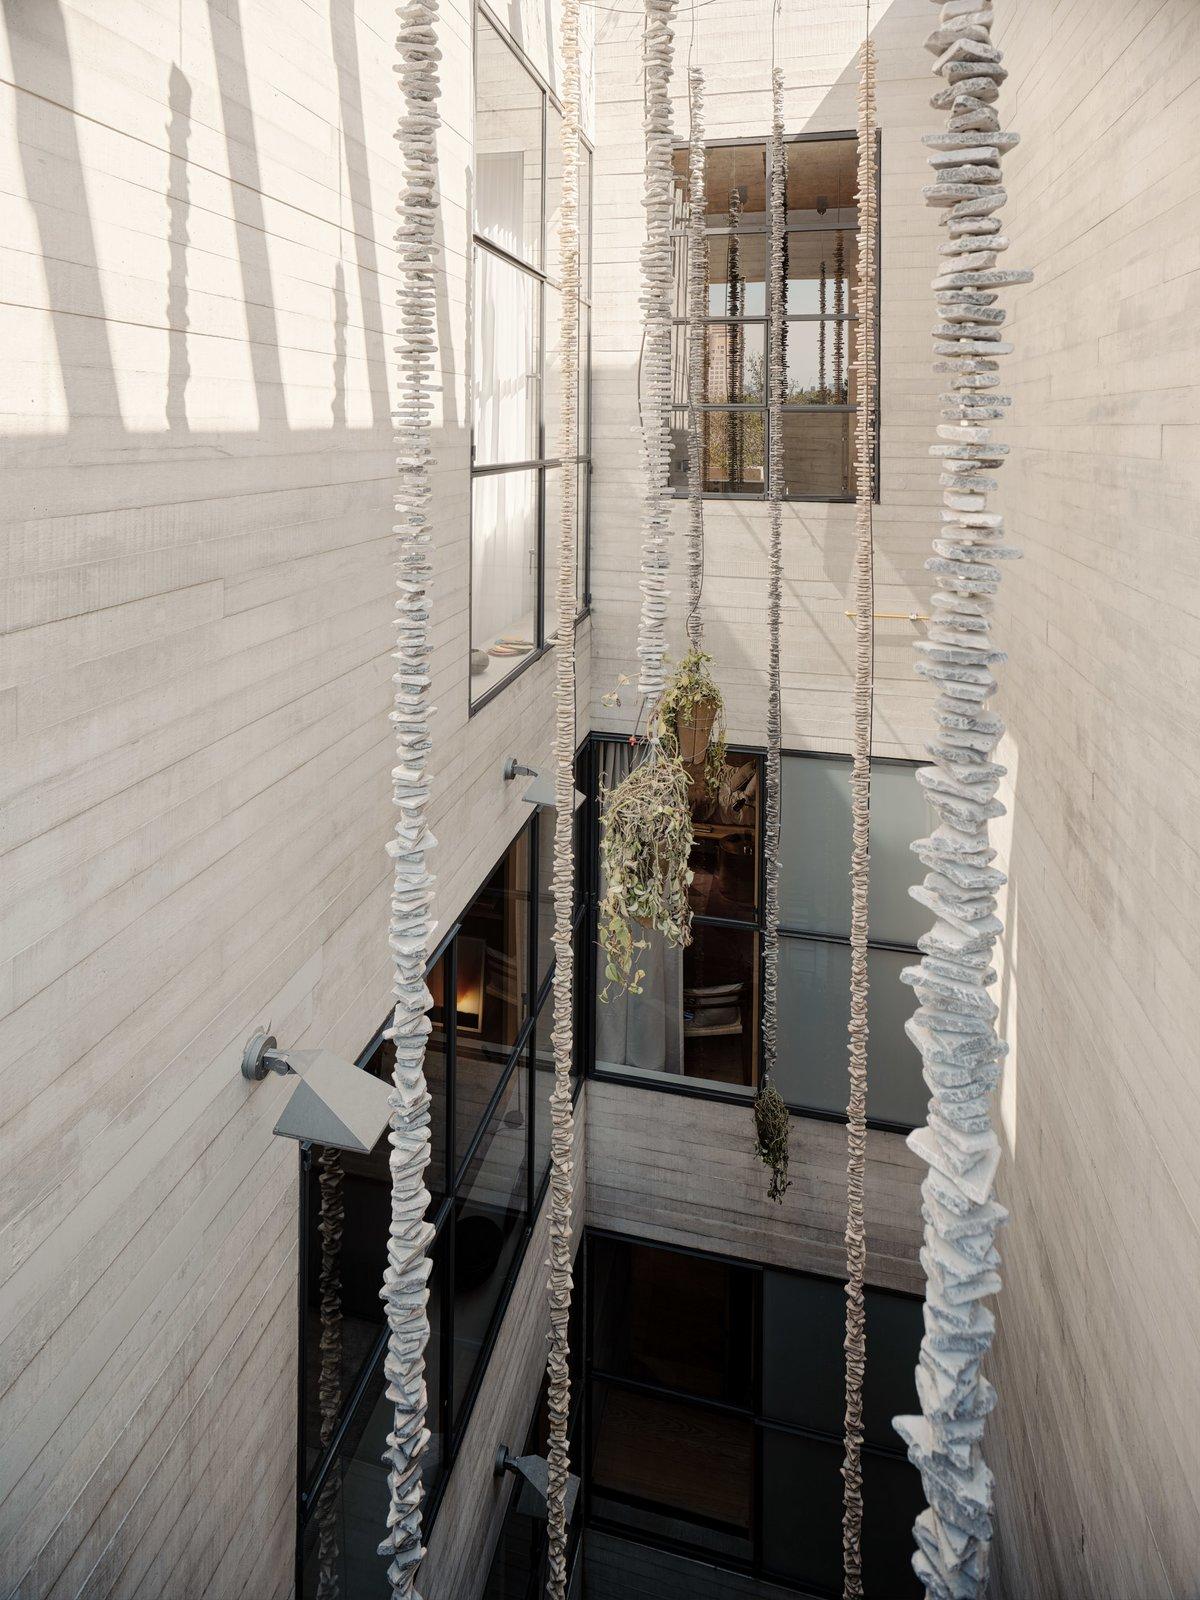 Tennyson 205 Rick Joy Polanco Apartment Light well